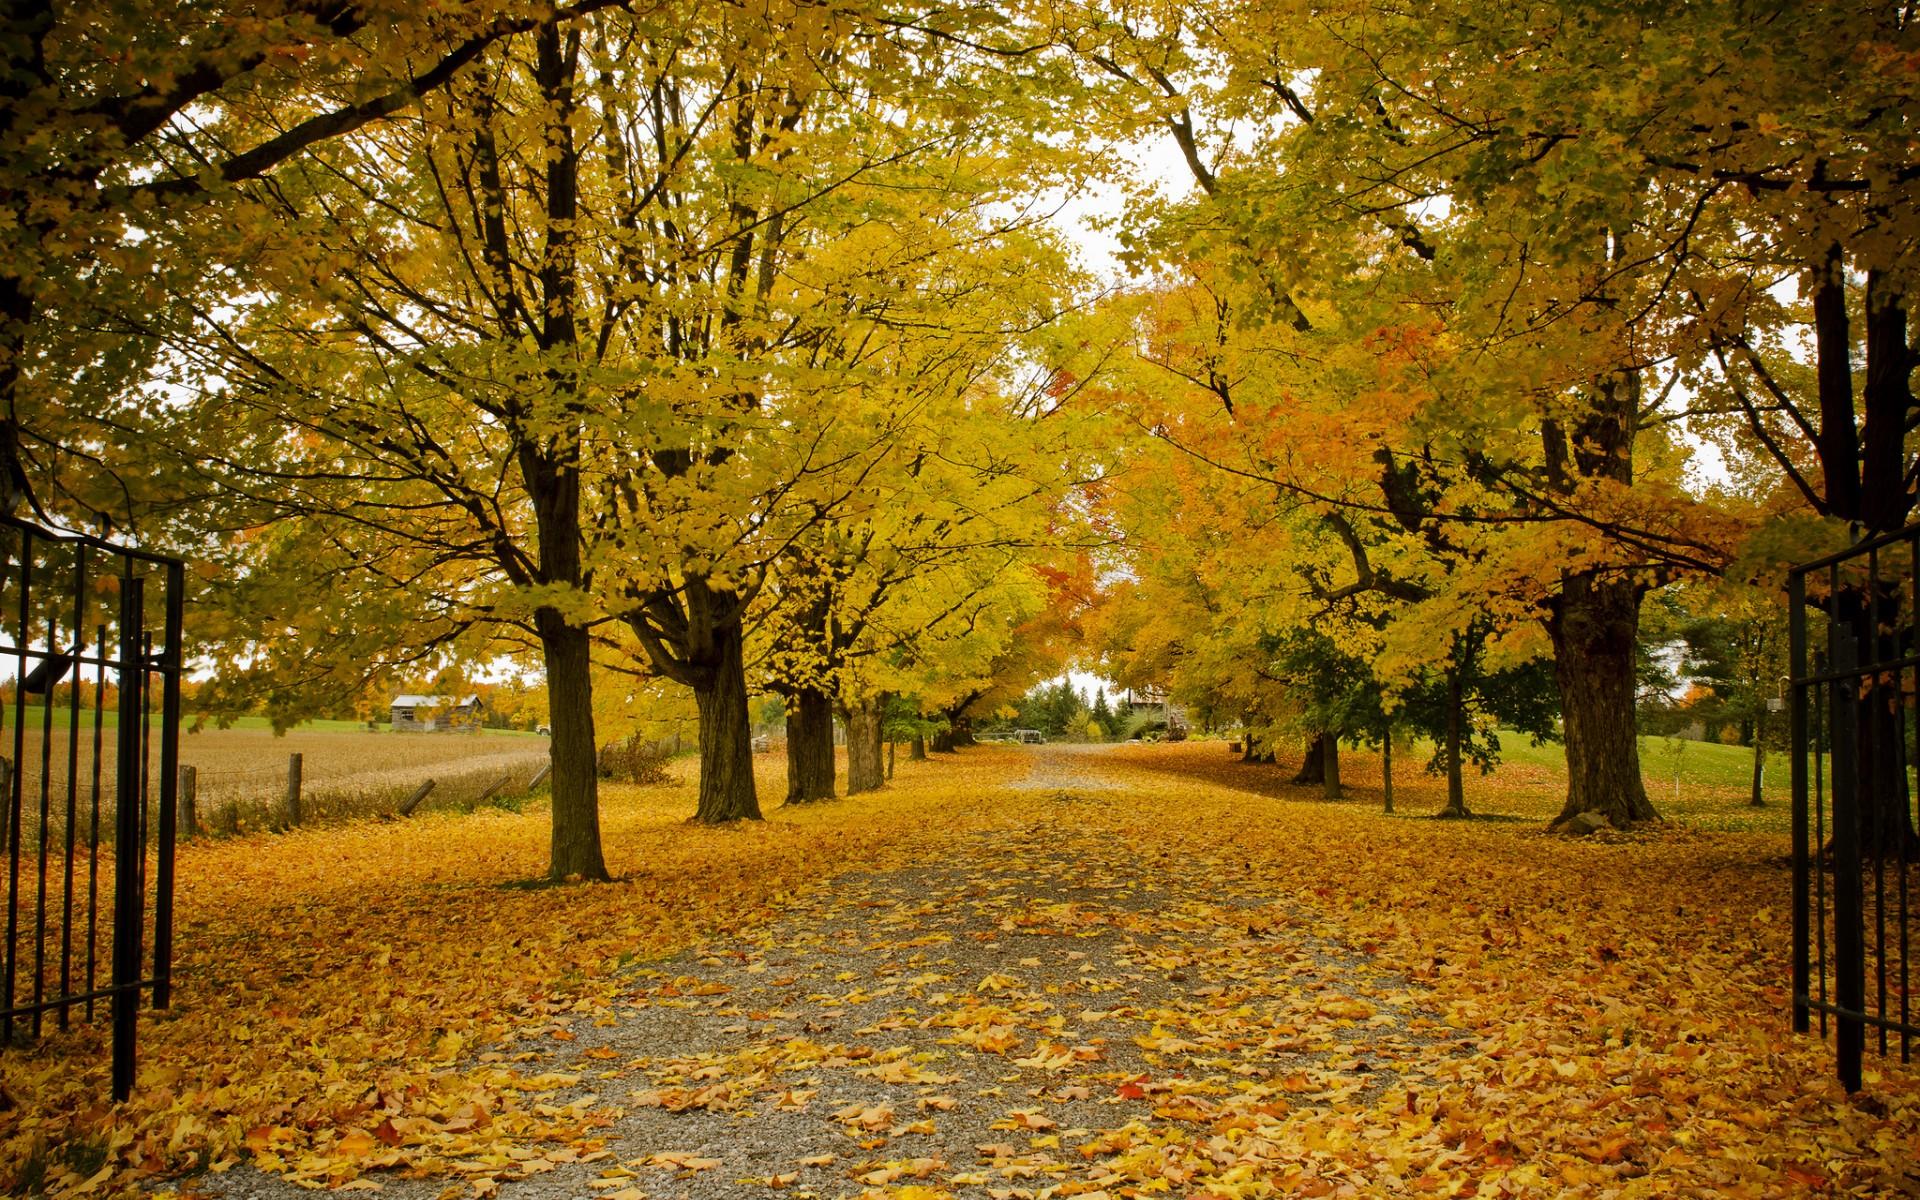 Autumn morning quotes quotesgram for Immagini autunno hd